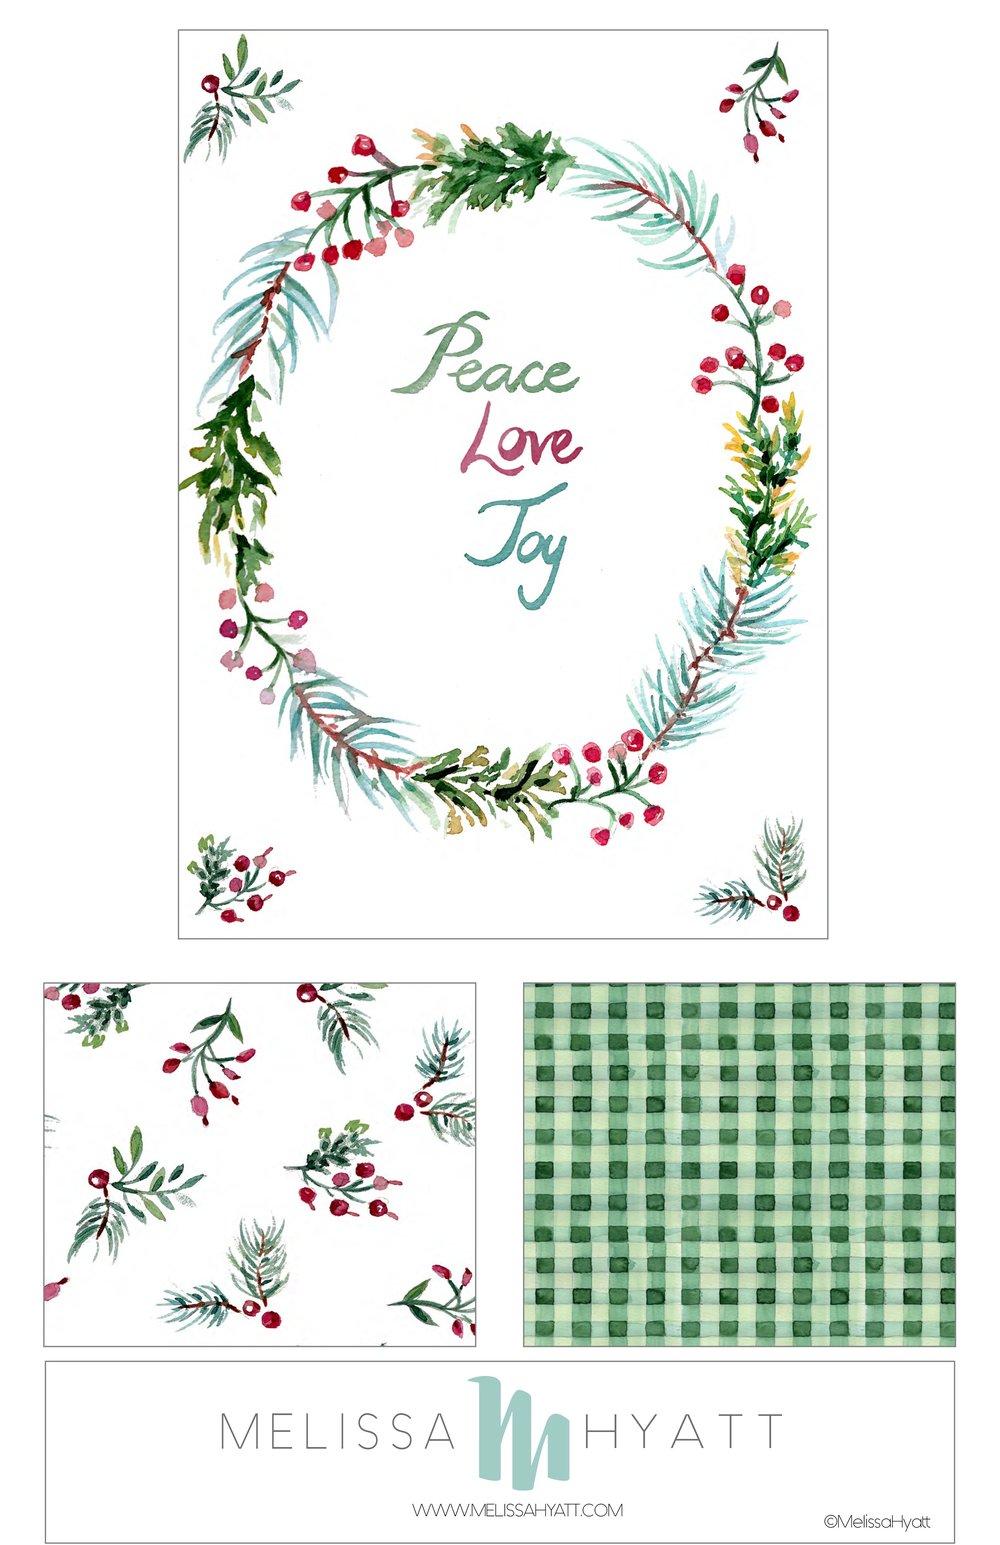 80_MELISSAHYATT_PEACE LOVE JOY.jpg